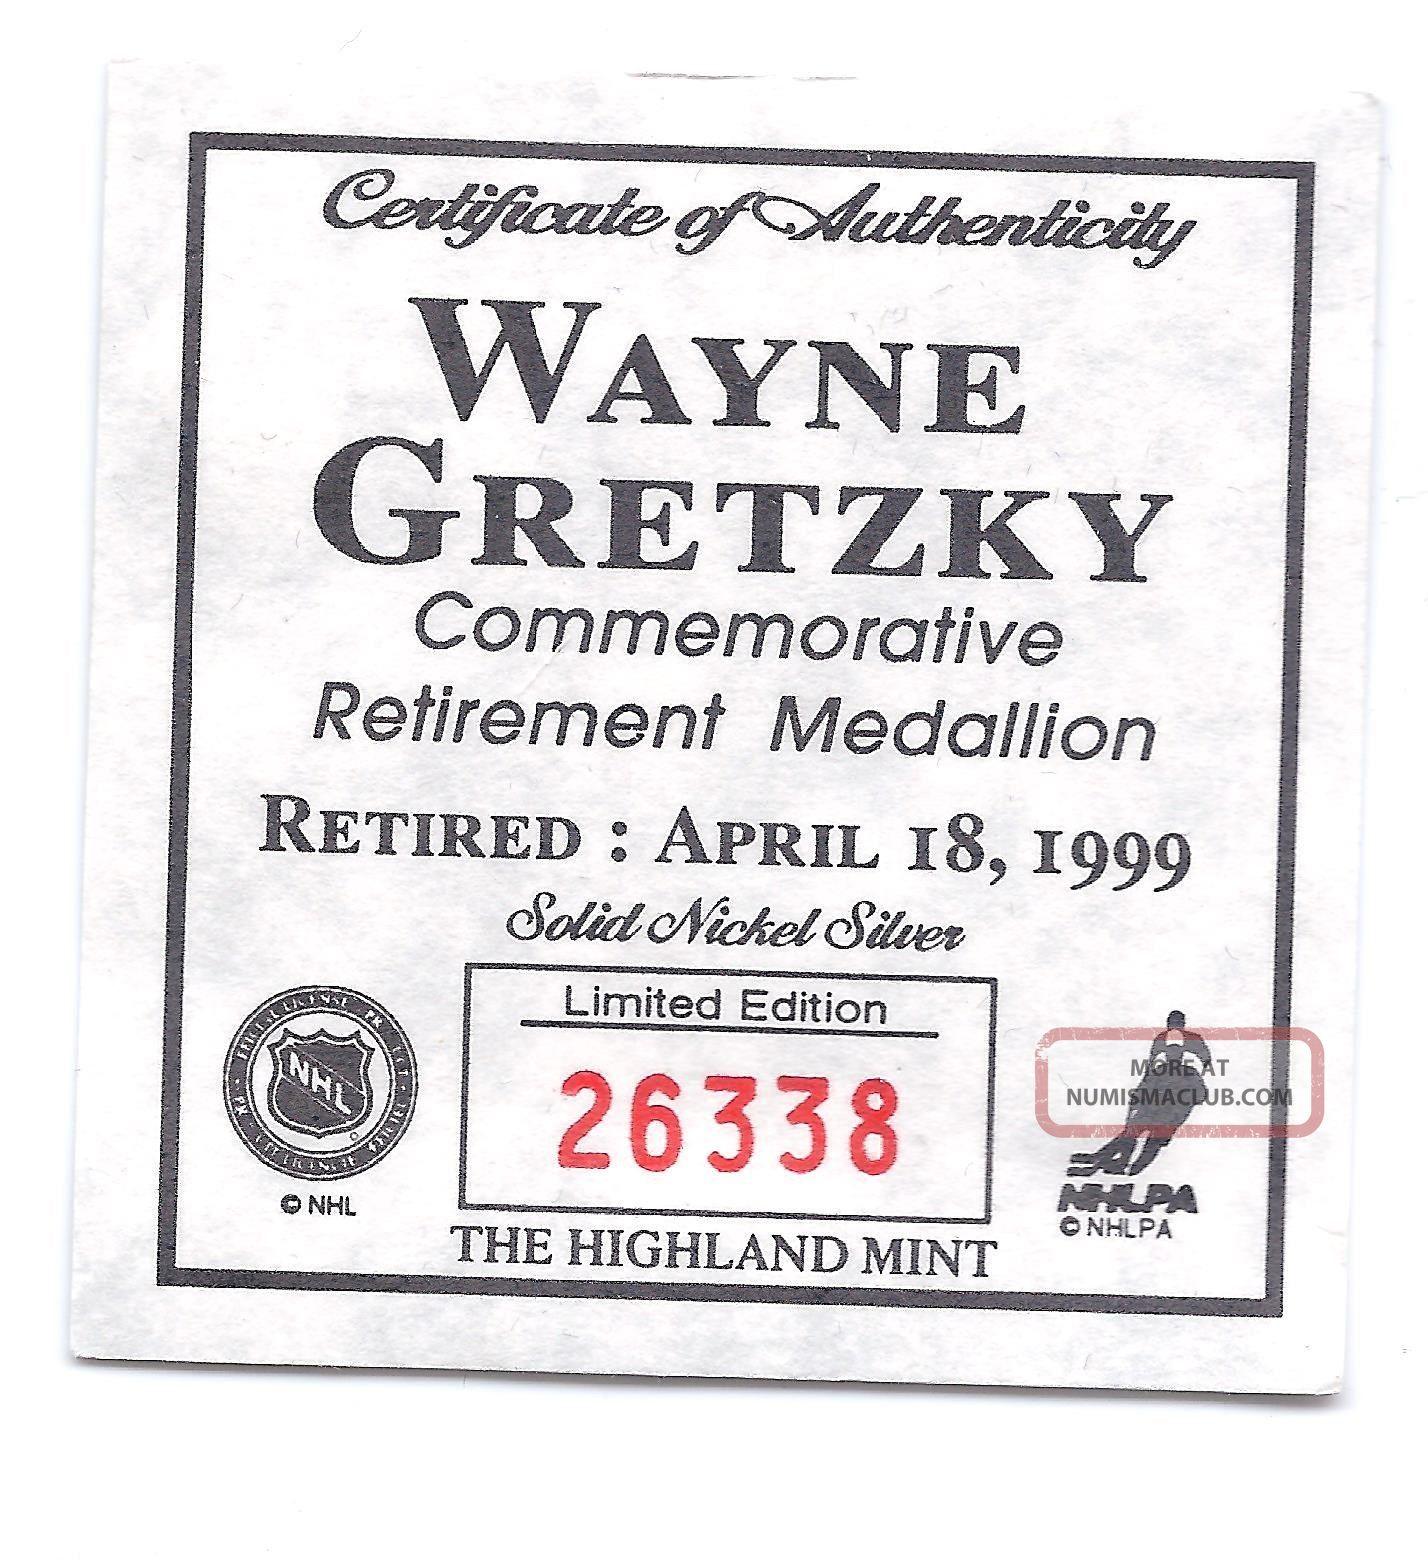 Oilers Kings Rangers Blues Wayne Gretzky Commemorative